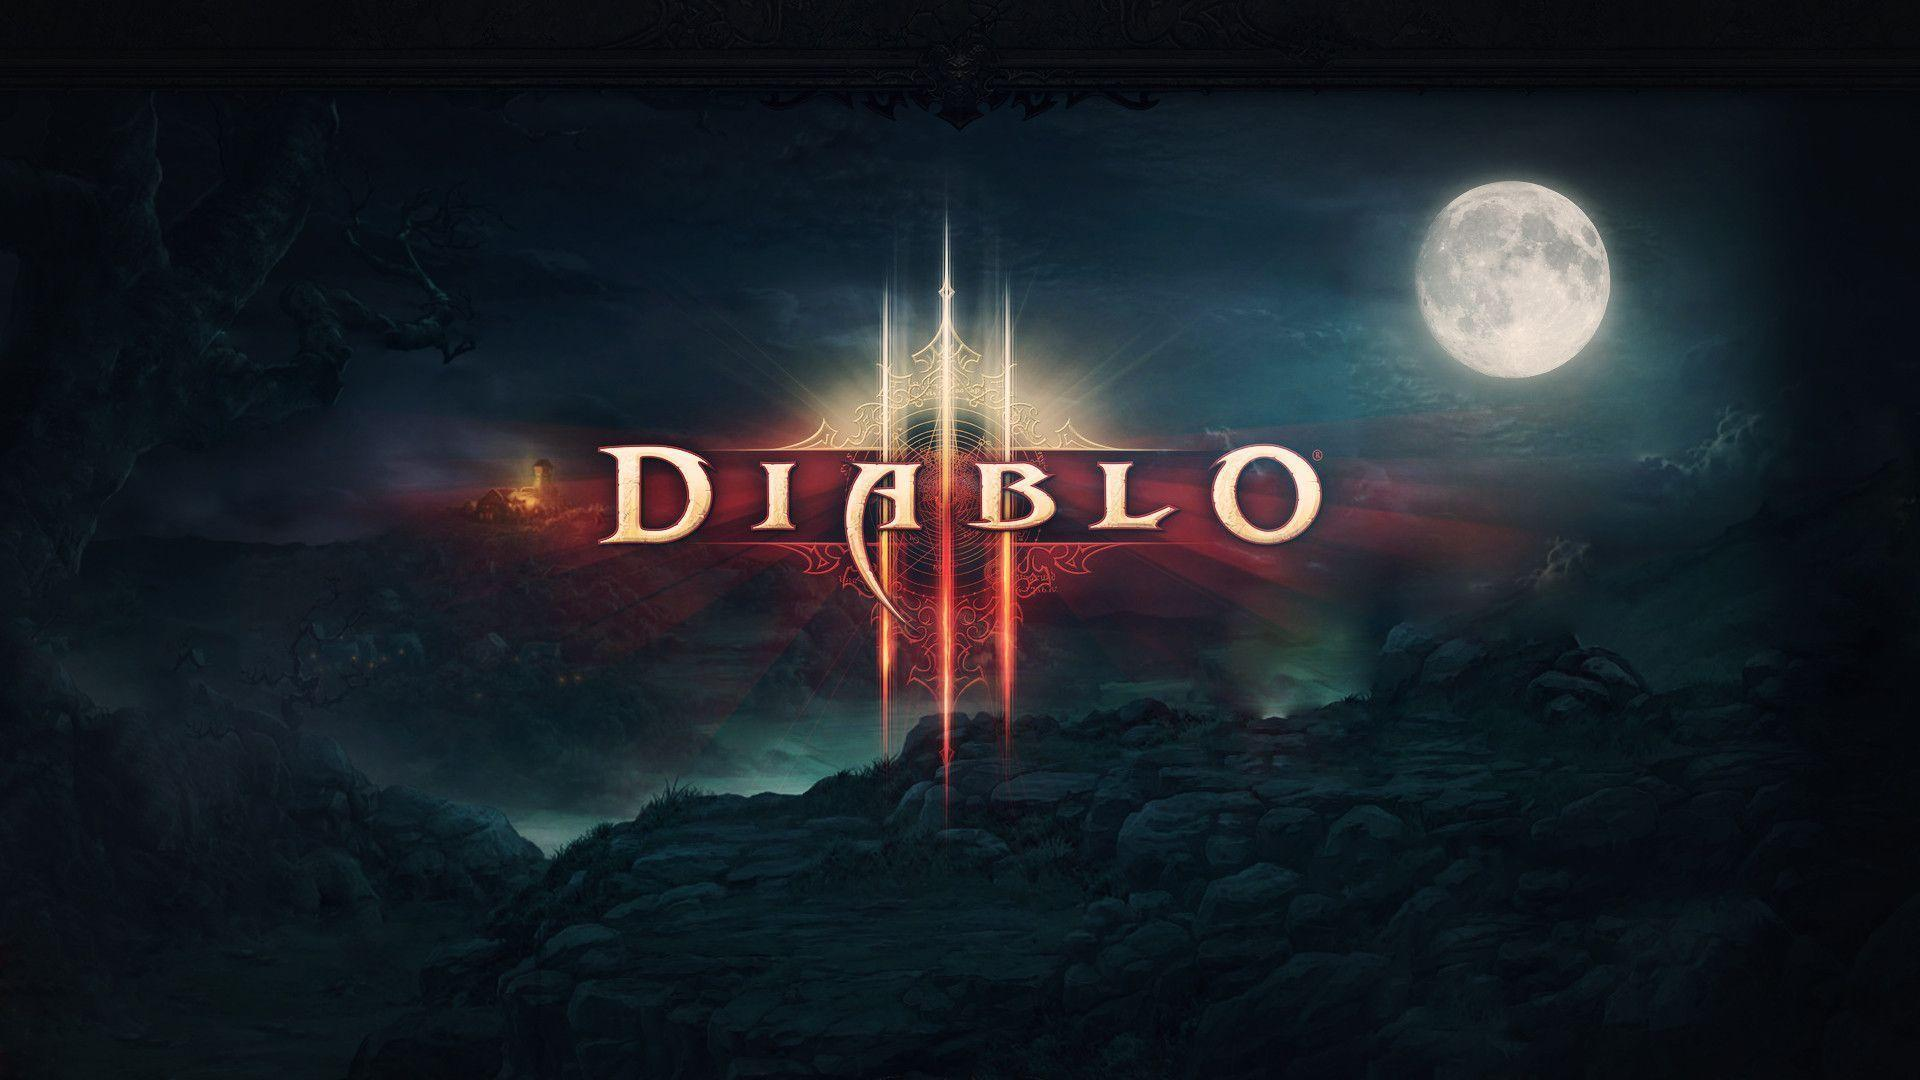 Games | Full HD Wallpapers, download 1080p desktop backgrounds